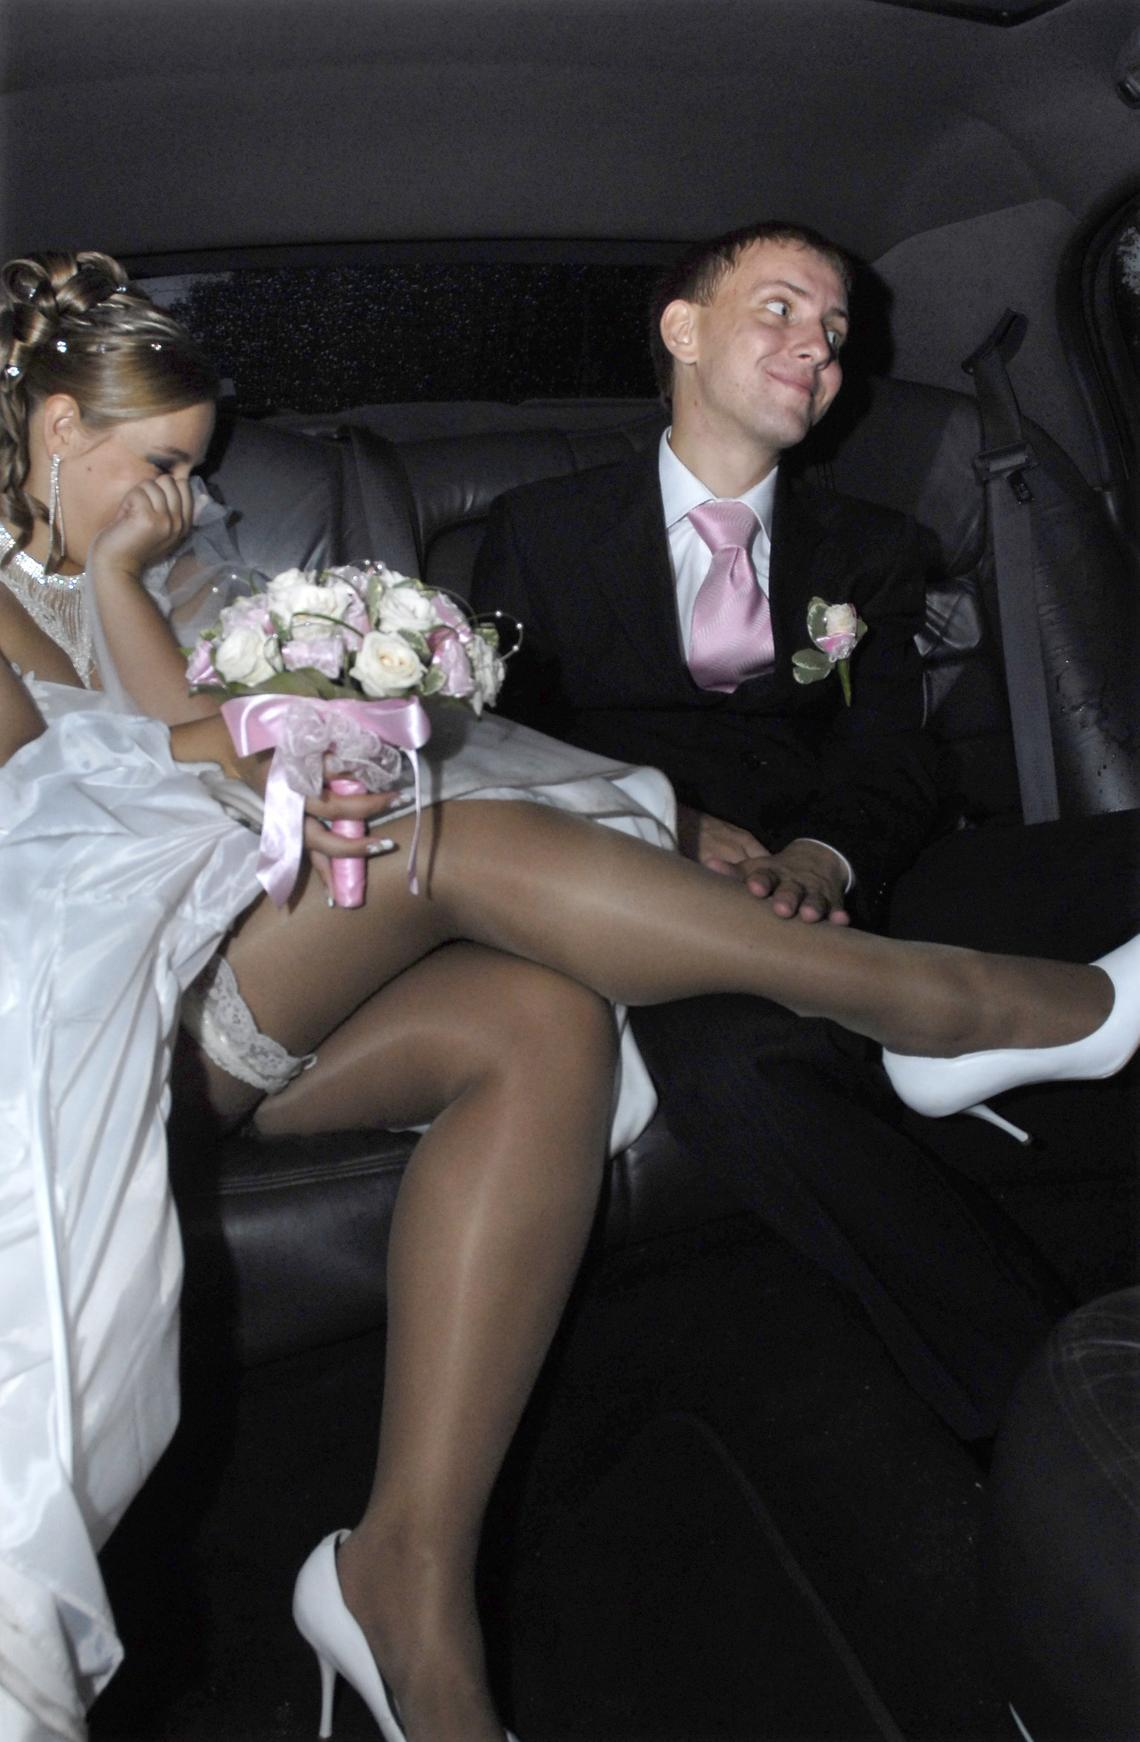 Wedding candid upskirt